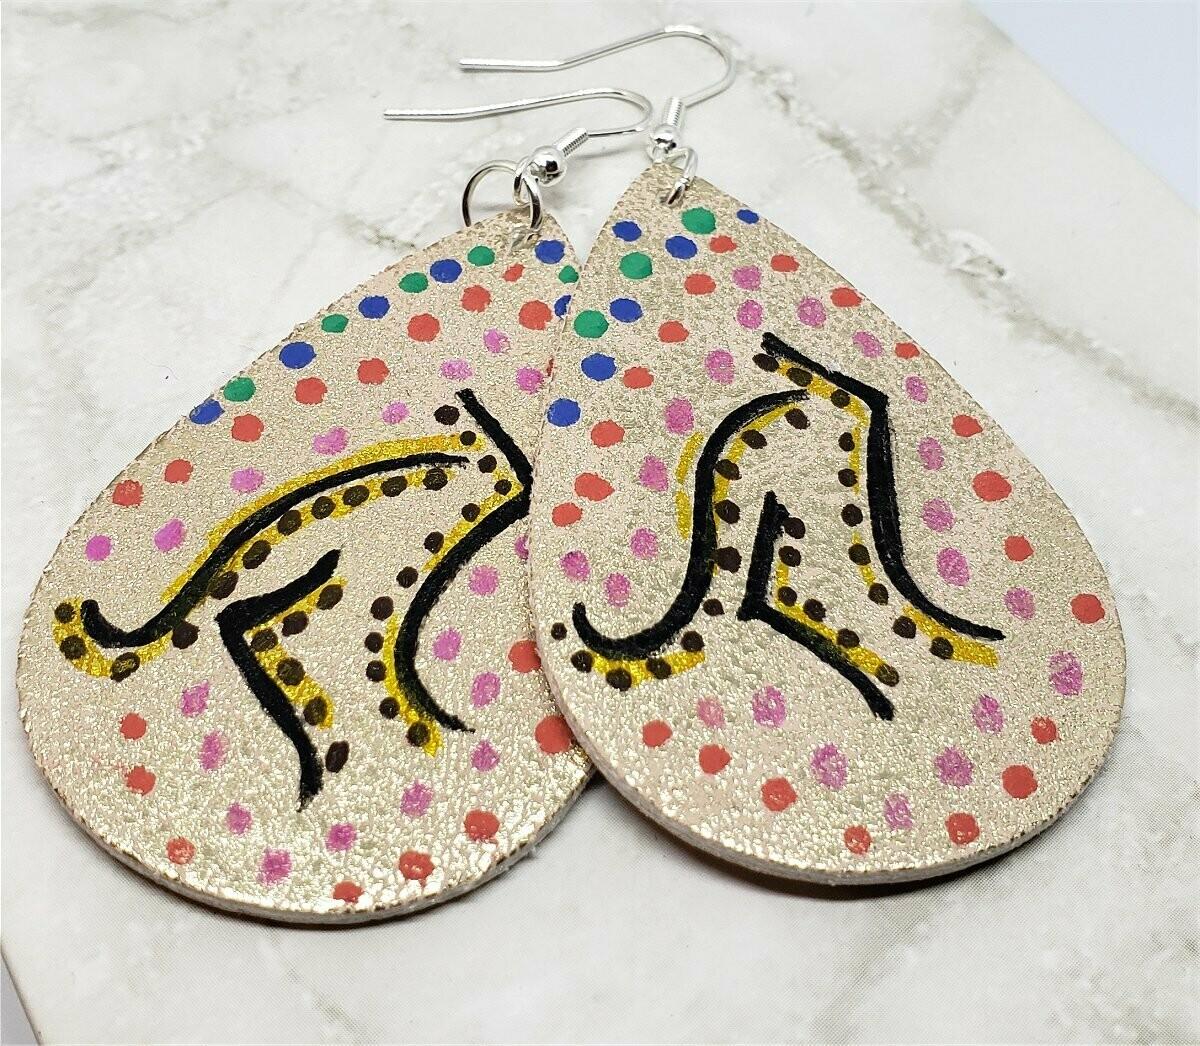 Aboriginal Style Art Hand Painted Kangaroo FAUX Leather Distressed Metallic Teardrop Shaped Earrings